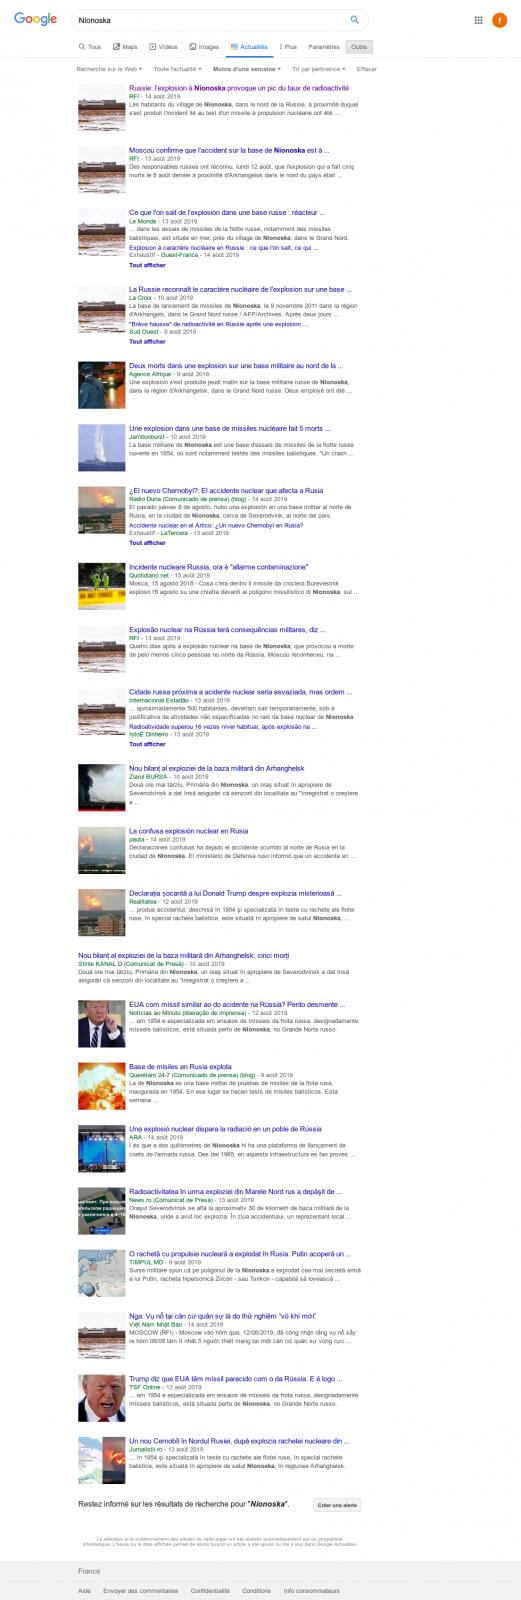 Screenshot_2019-08-16 Nionoska - Recherche Google.png